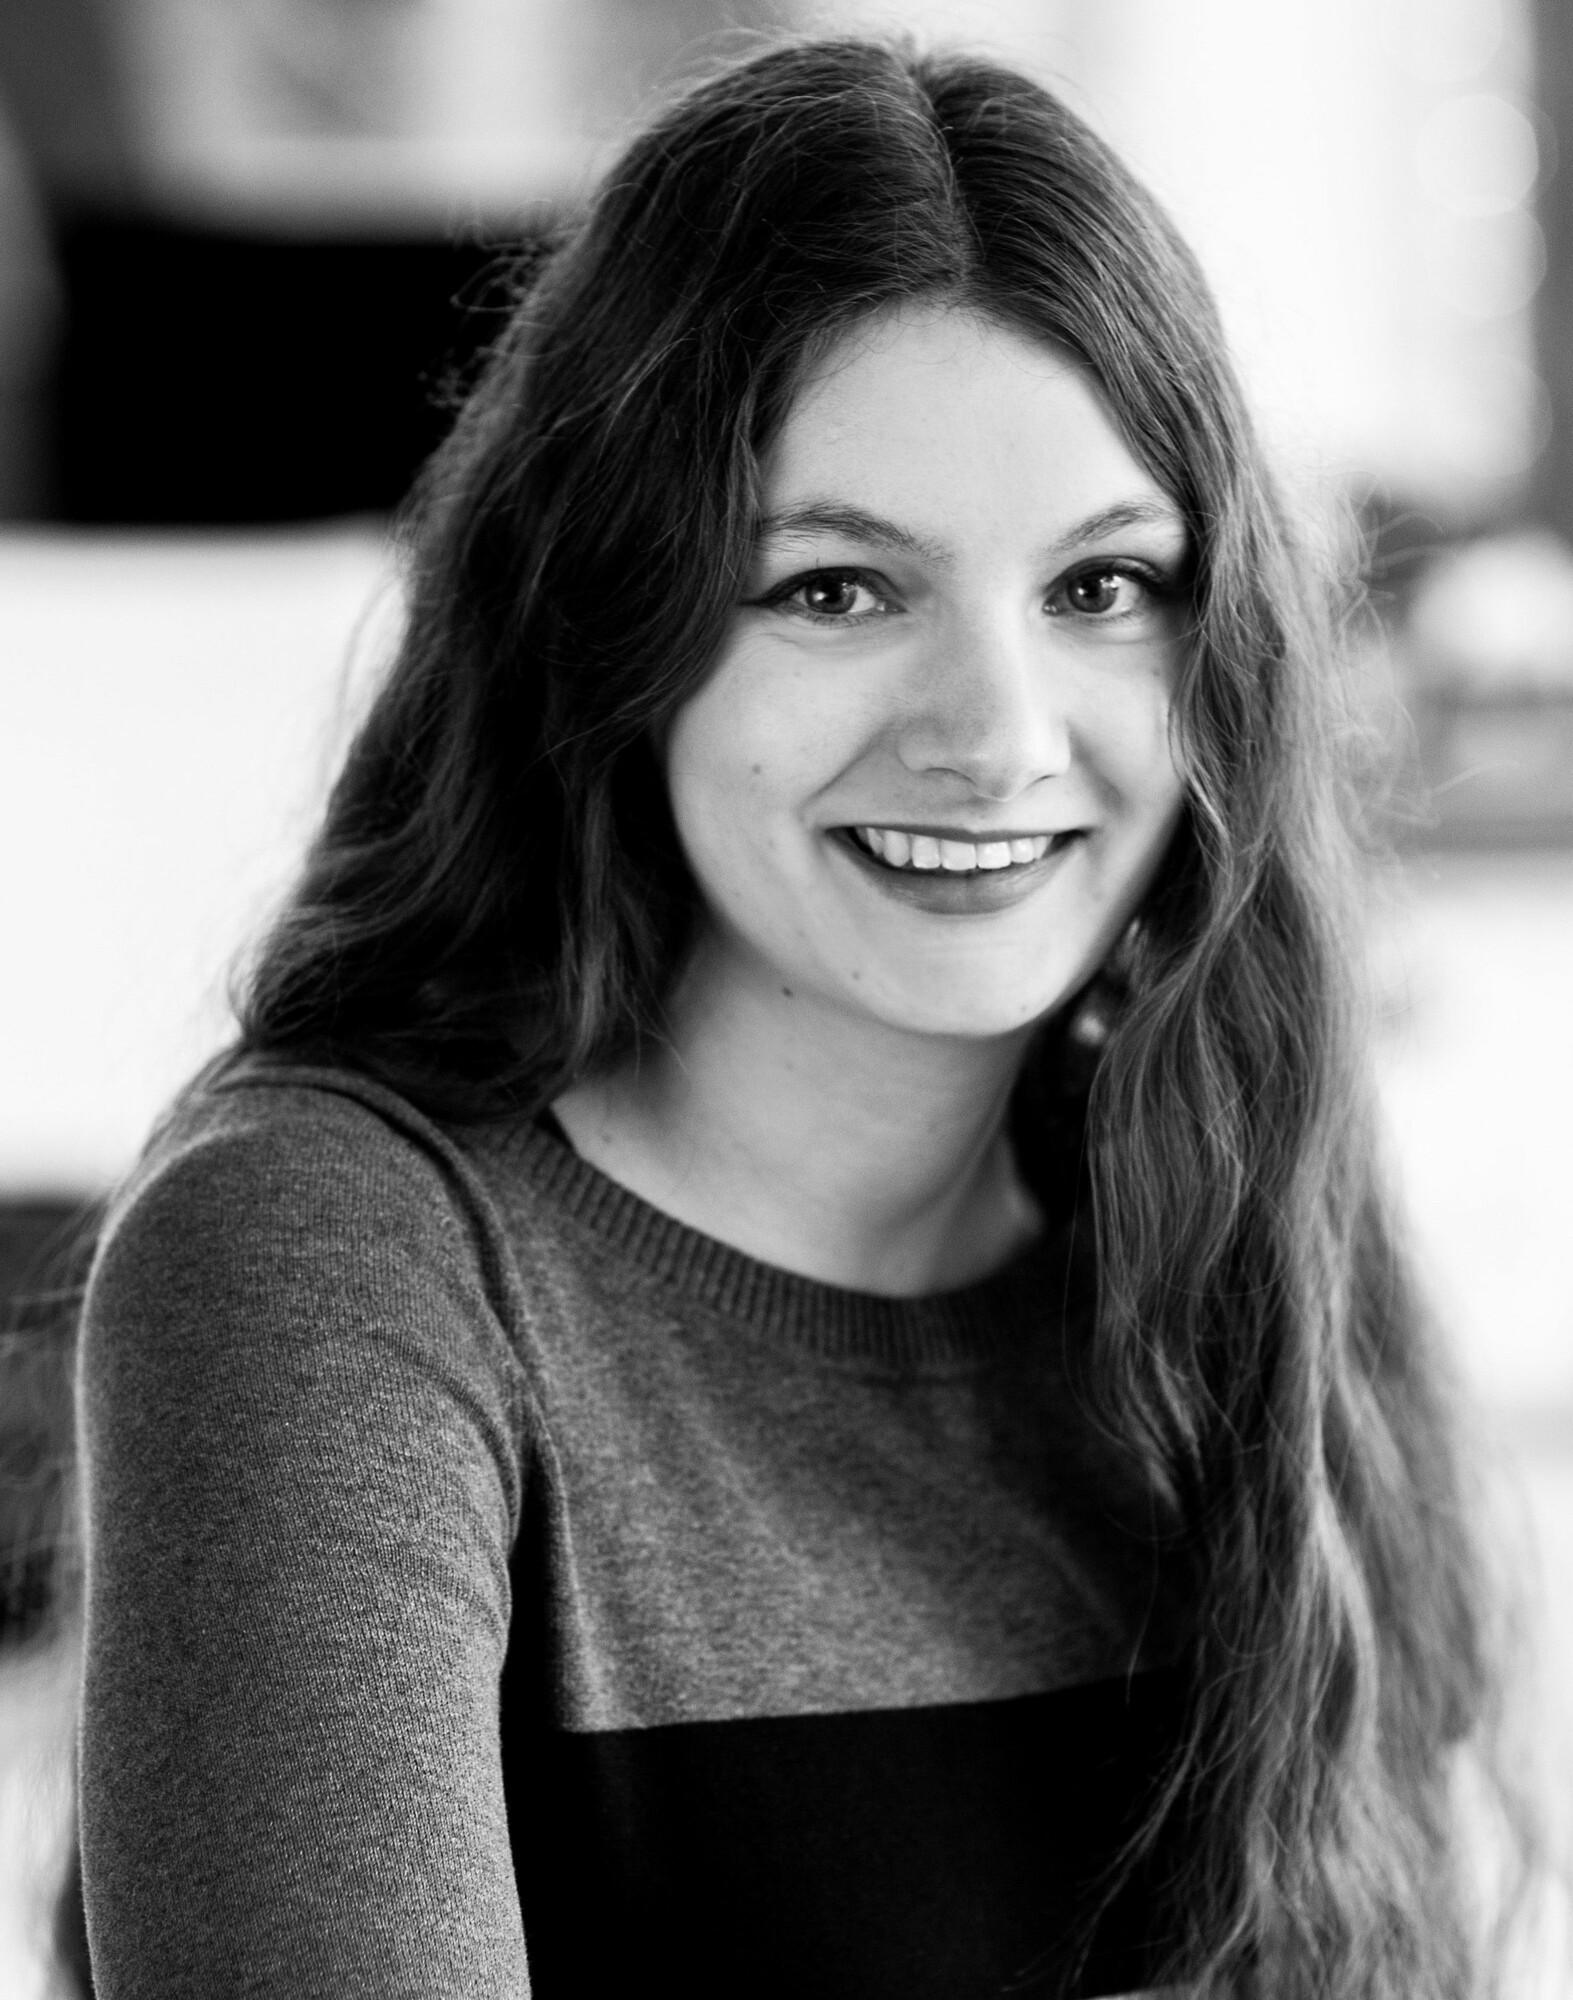 Leonie Zijlstra